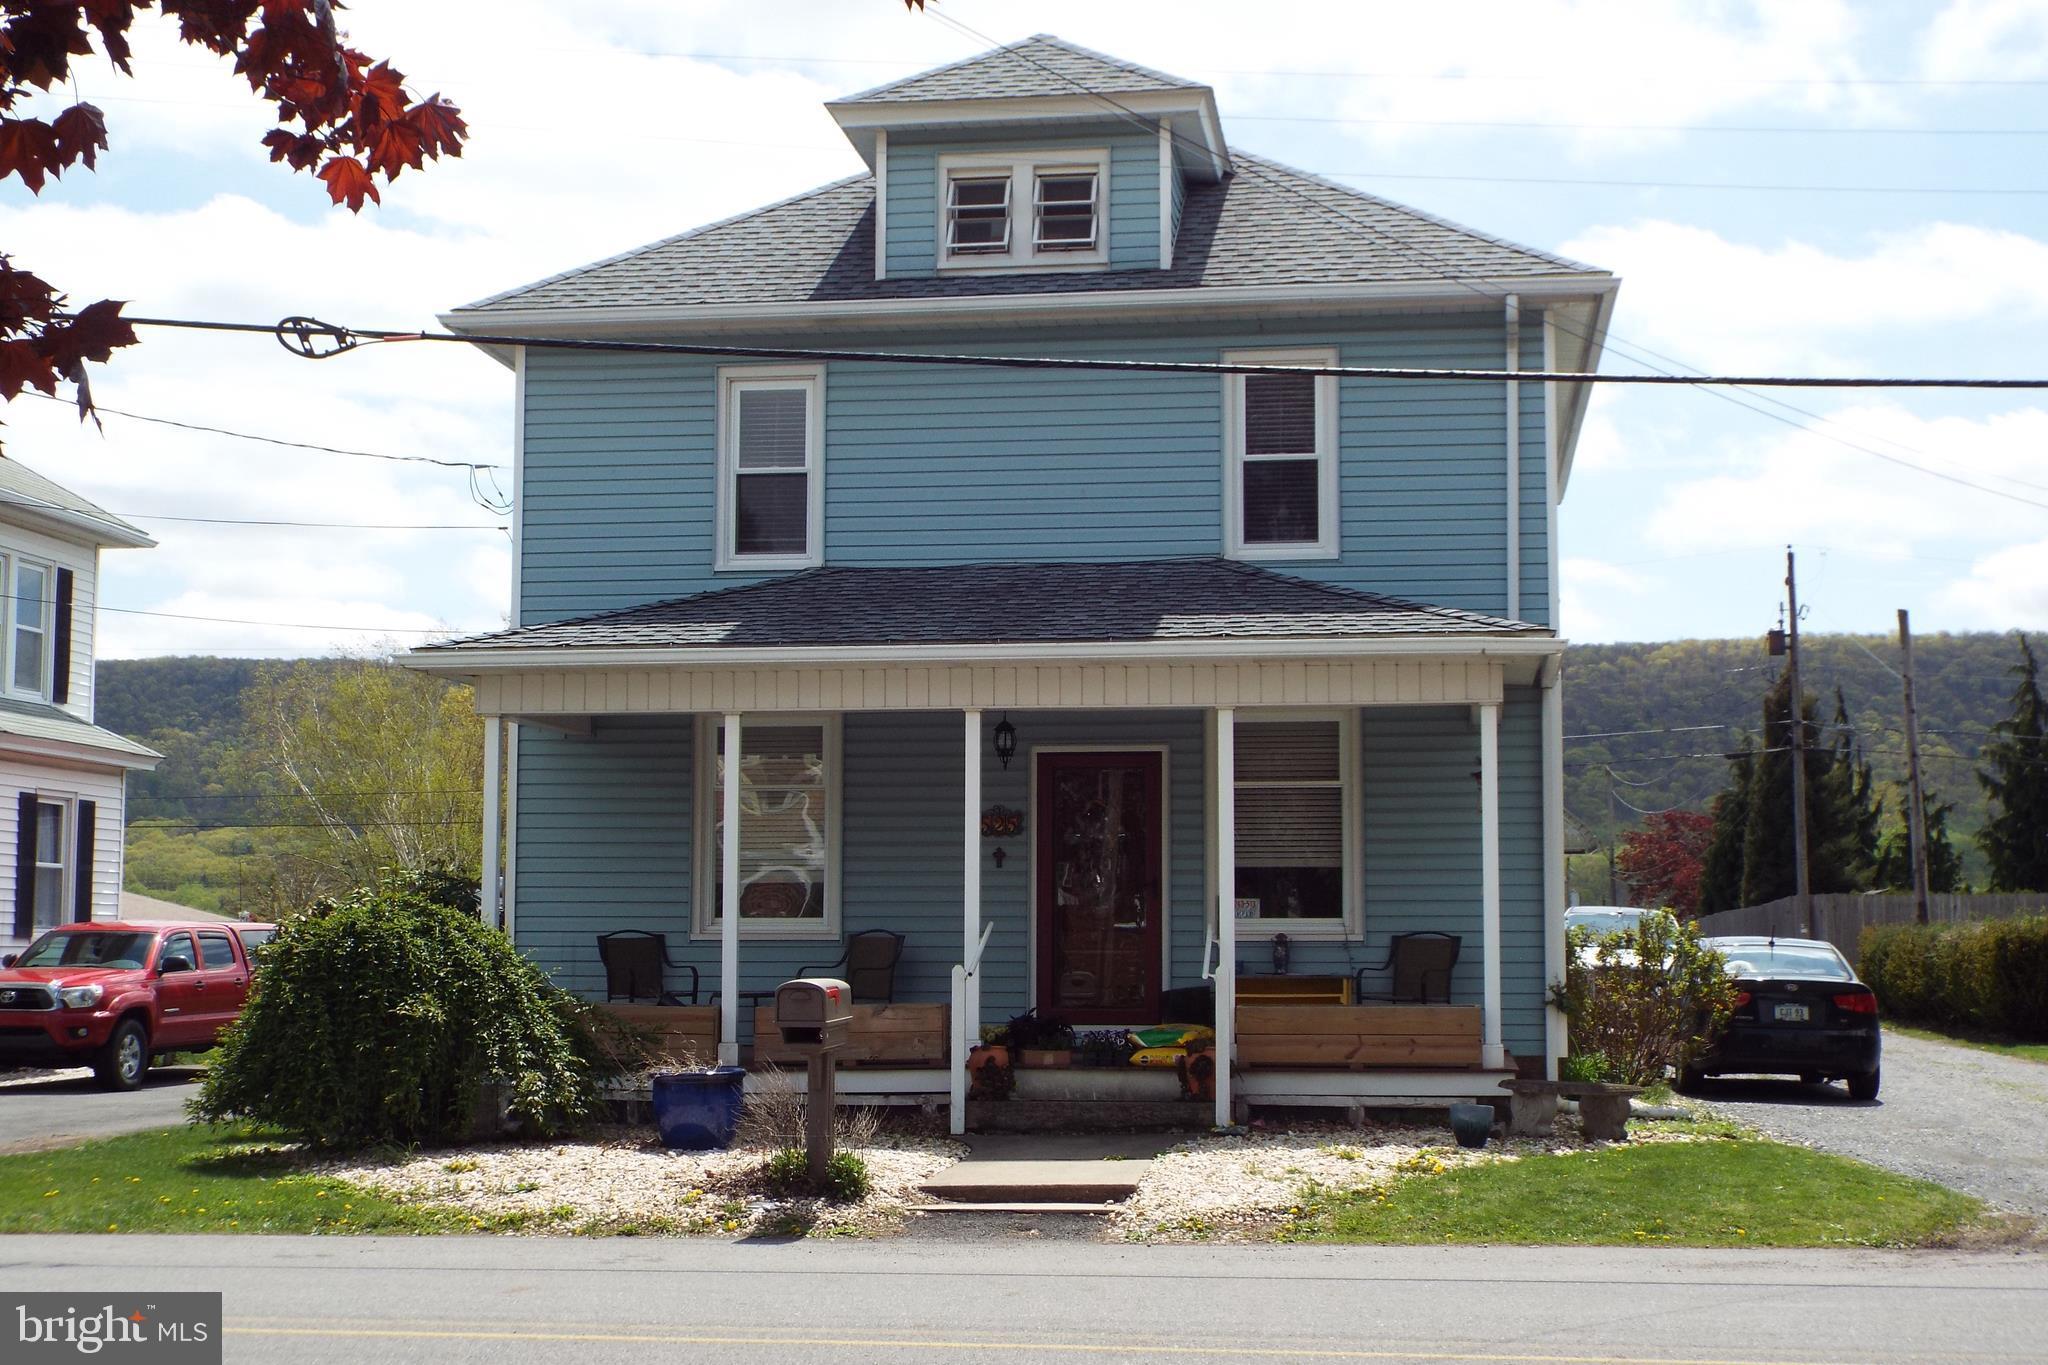 525 E CHESTNUT STREET, HEGINS, PA 17938